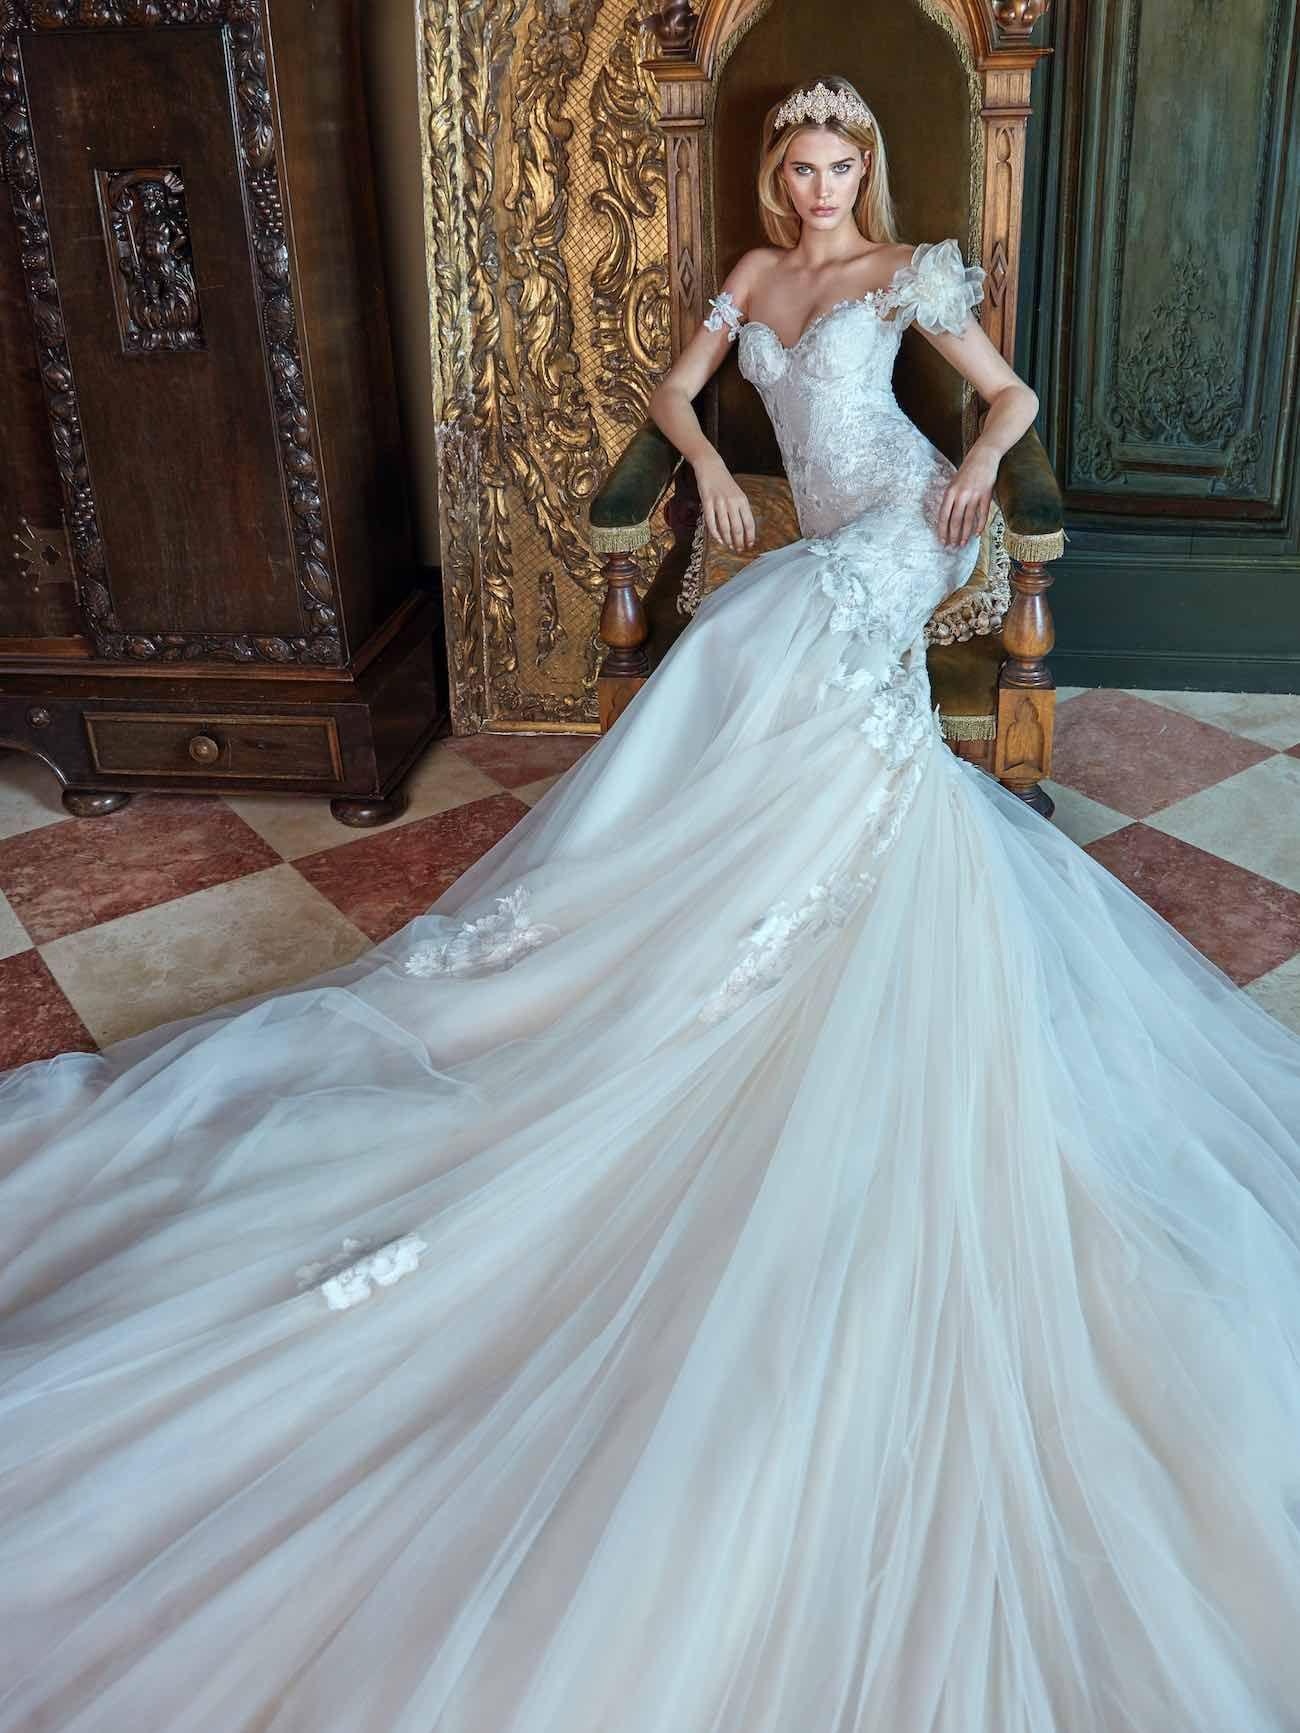 Introducing Le Secret Royal By Galia Lahav Galia Lahav Wedding - Galia Lahav Wedding Dresses